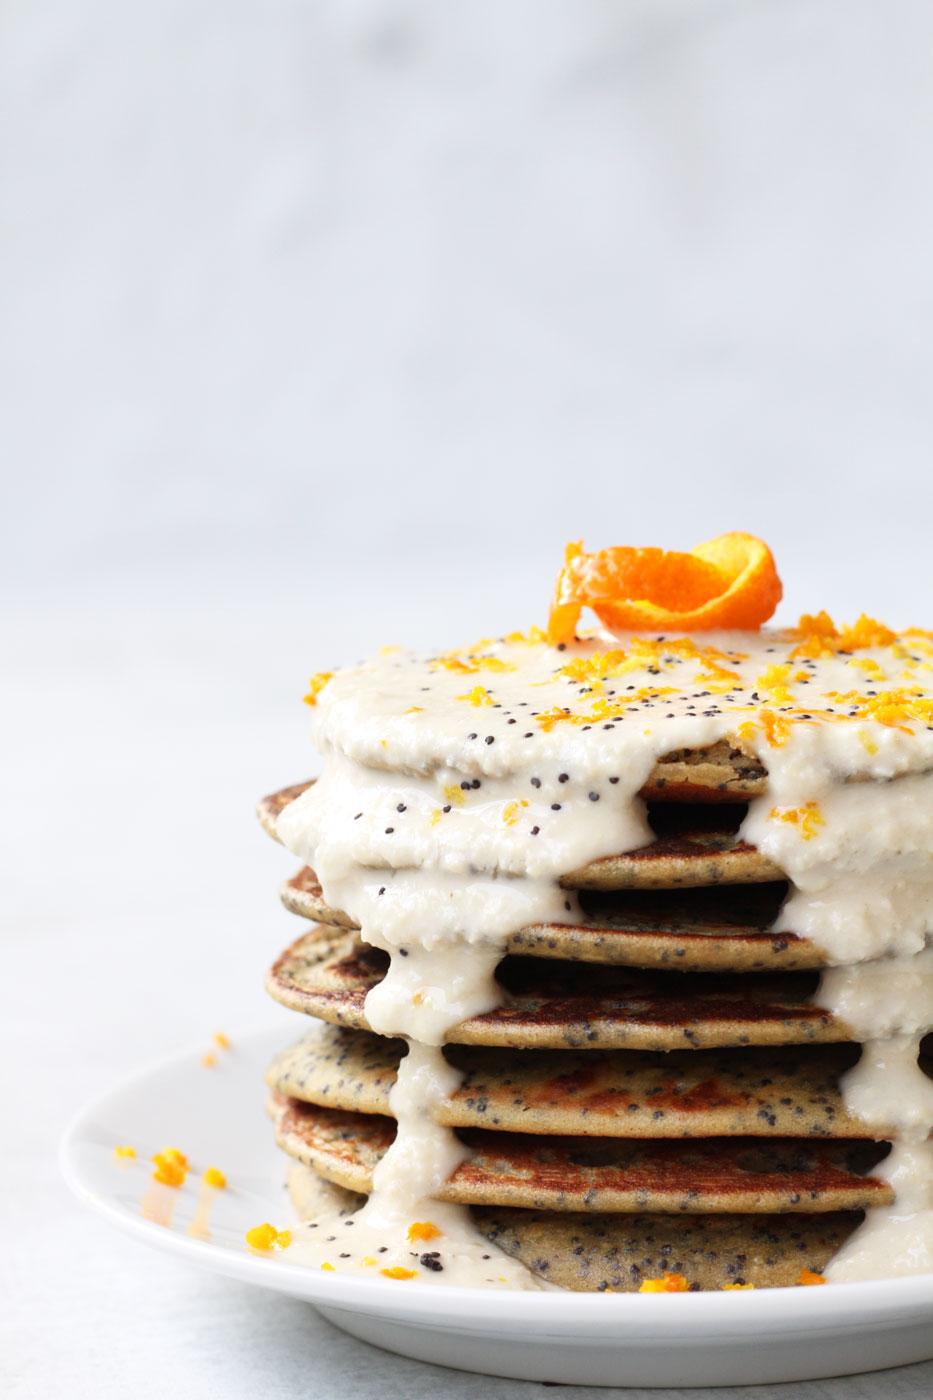 Vegan Orange Poppyseed Quinoa Pancakes - high in plant-based protein